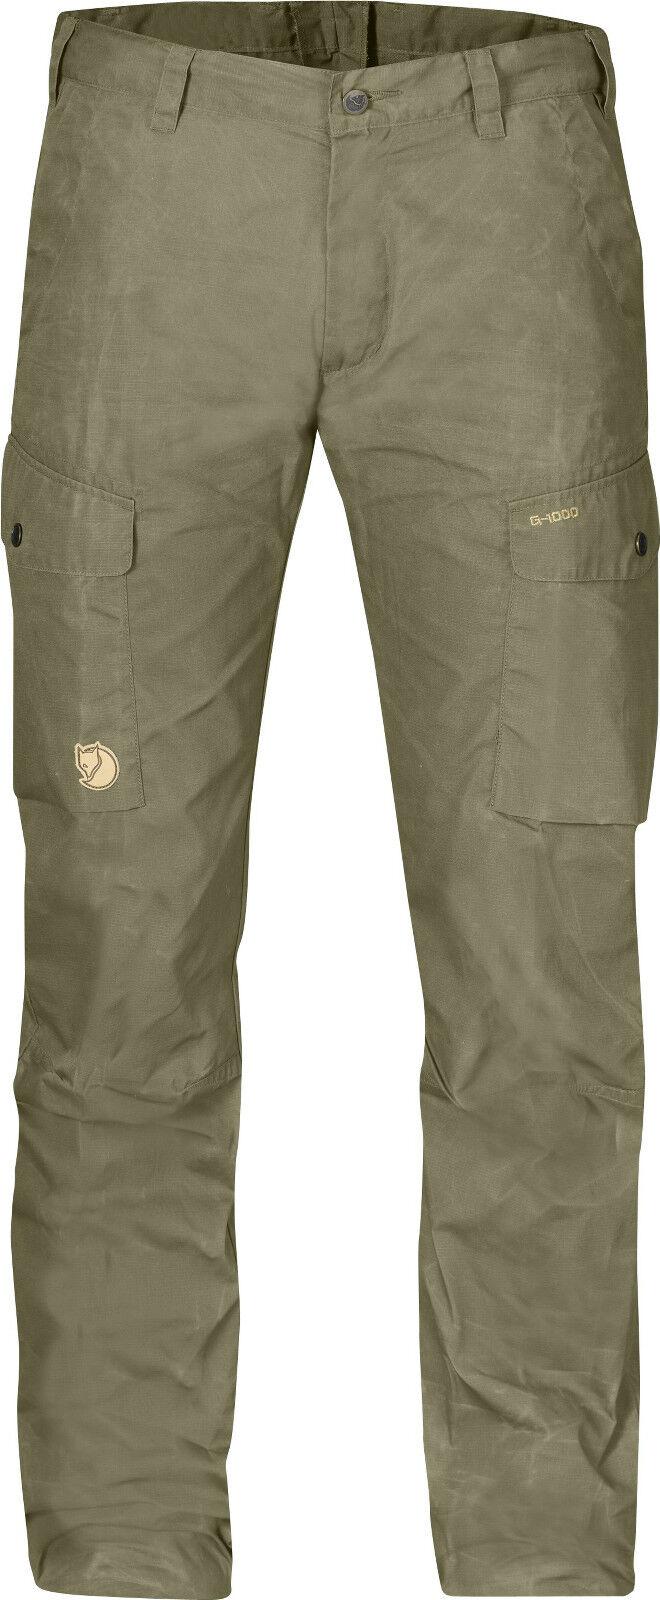 Fjällräven ruaha trs. 81185 light caqui g-1000 Lite pantalones outdoorhose wanderhose